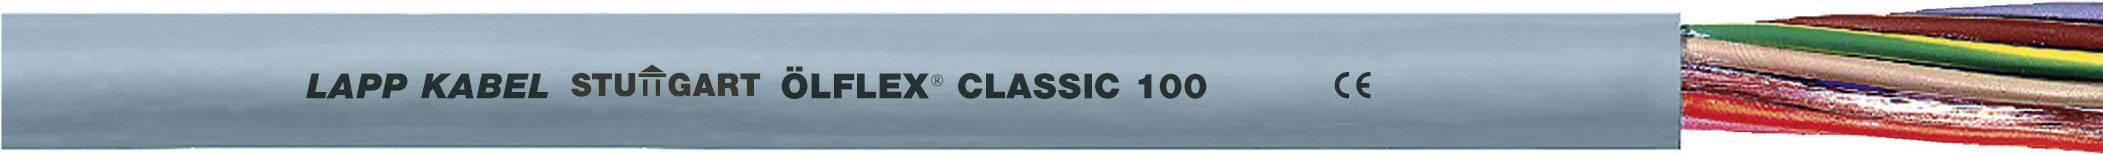 Kabel LappKabel Ölflex CLASSIC 100 5X1,5 (00101304), PVC, 8,1 mm, 500 V, šedá, 1000 m